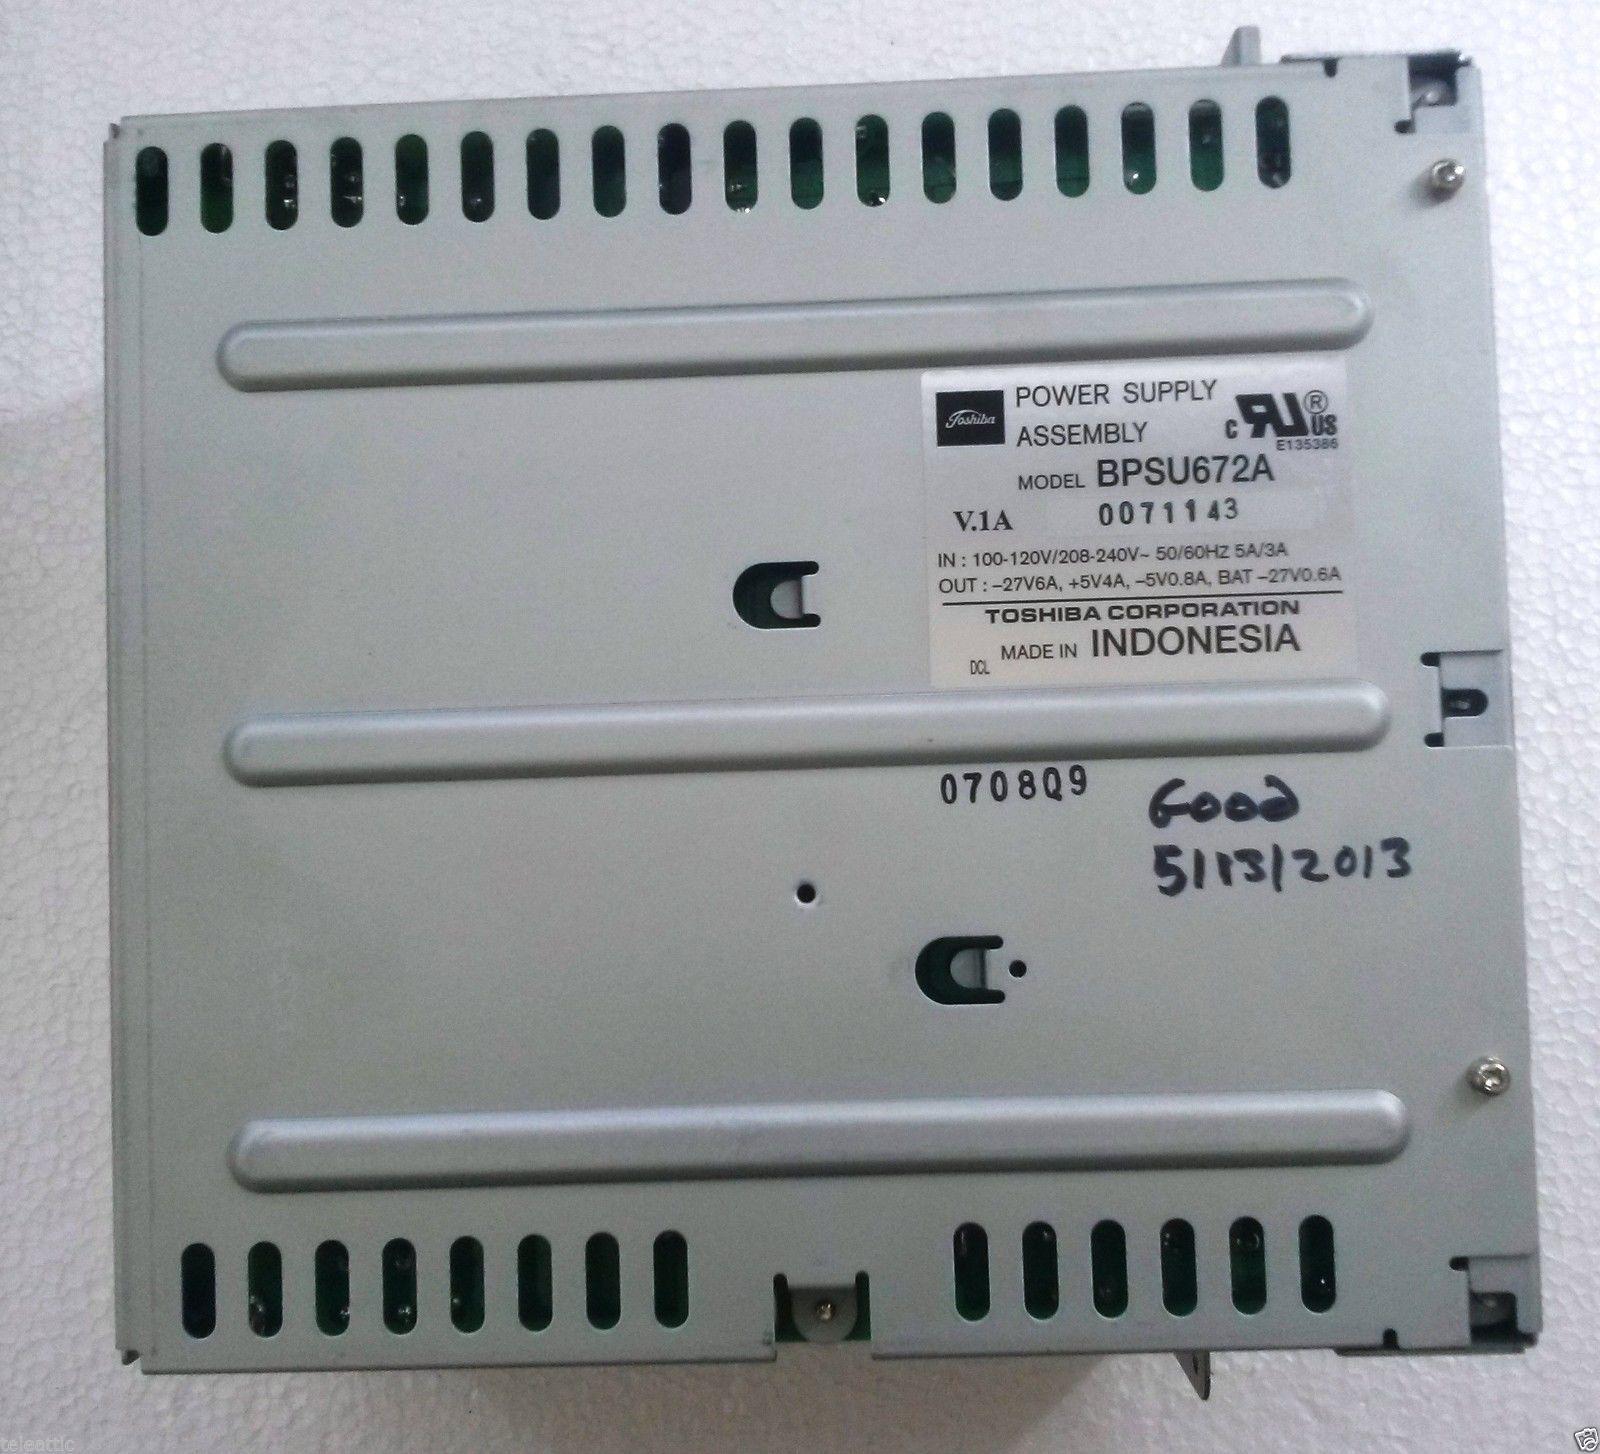 TOSHIBA DK424 POWER SUPPLY BPSU672A